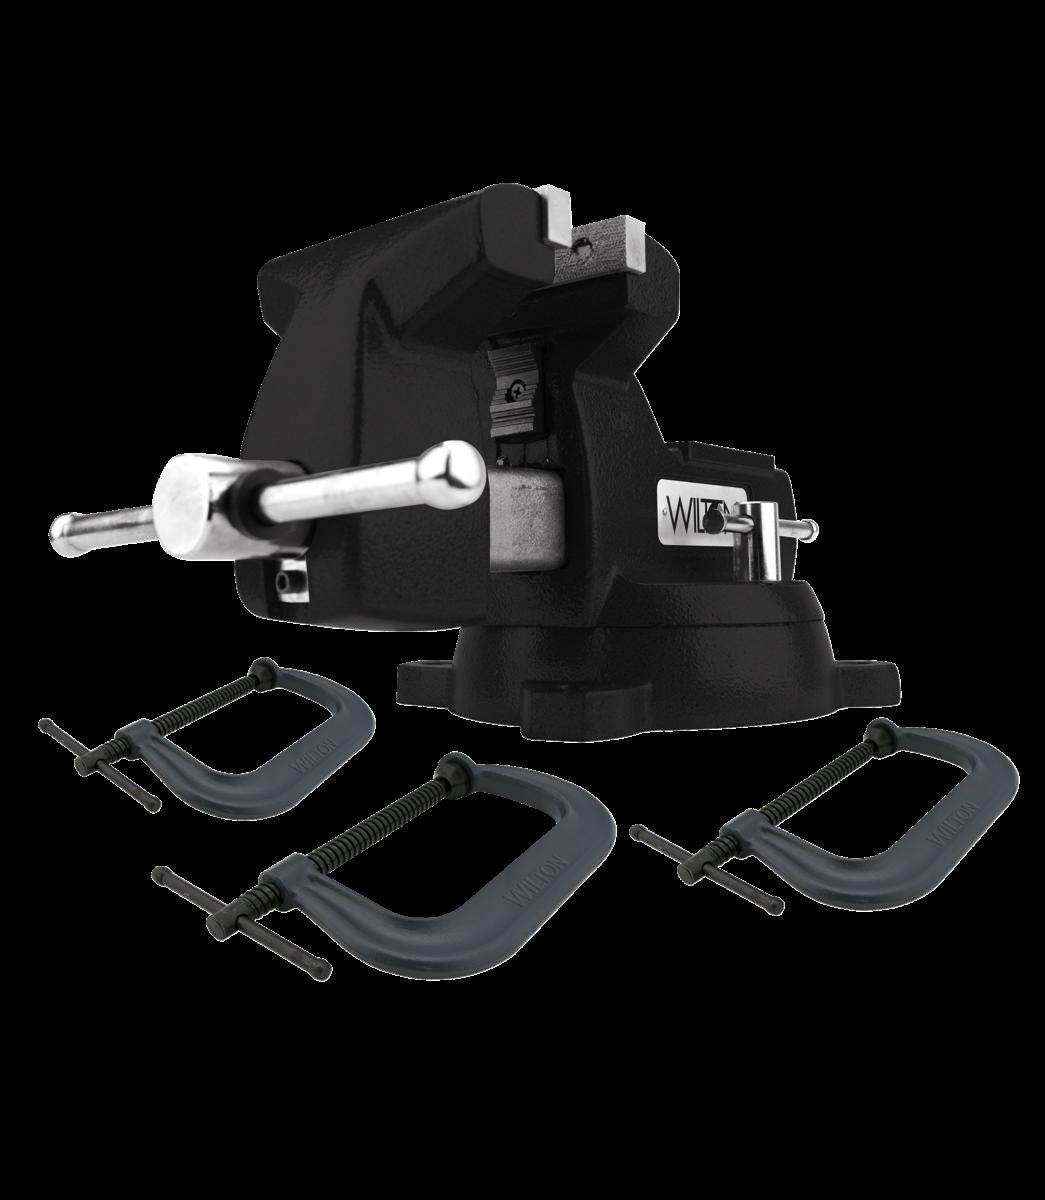 Manual: Holding Strong Kit, Black 746 Mechanics Vise and 3-pc 400 Series C-Clamp Set